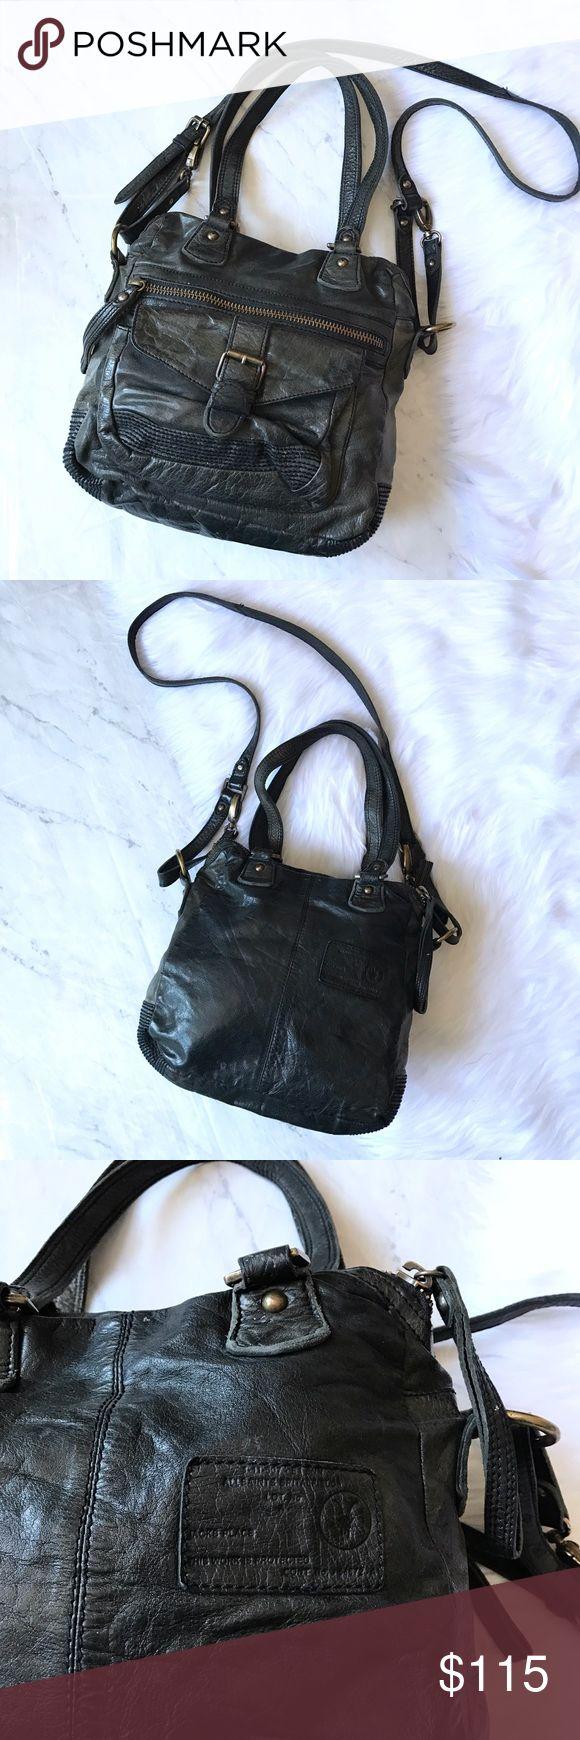 Allsaints All Saints crossbody leather bag Allsaints bag. Great condition. All Saints Bags Crossbody Bags